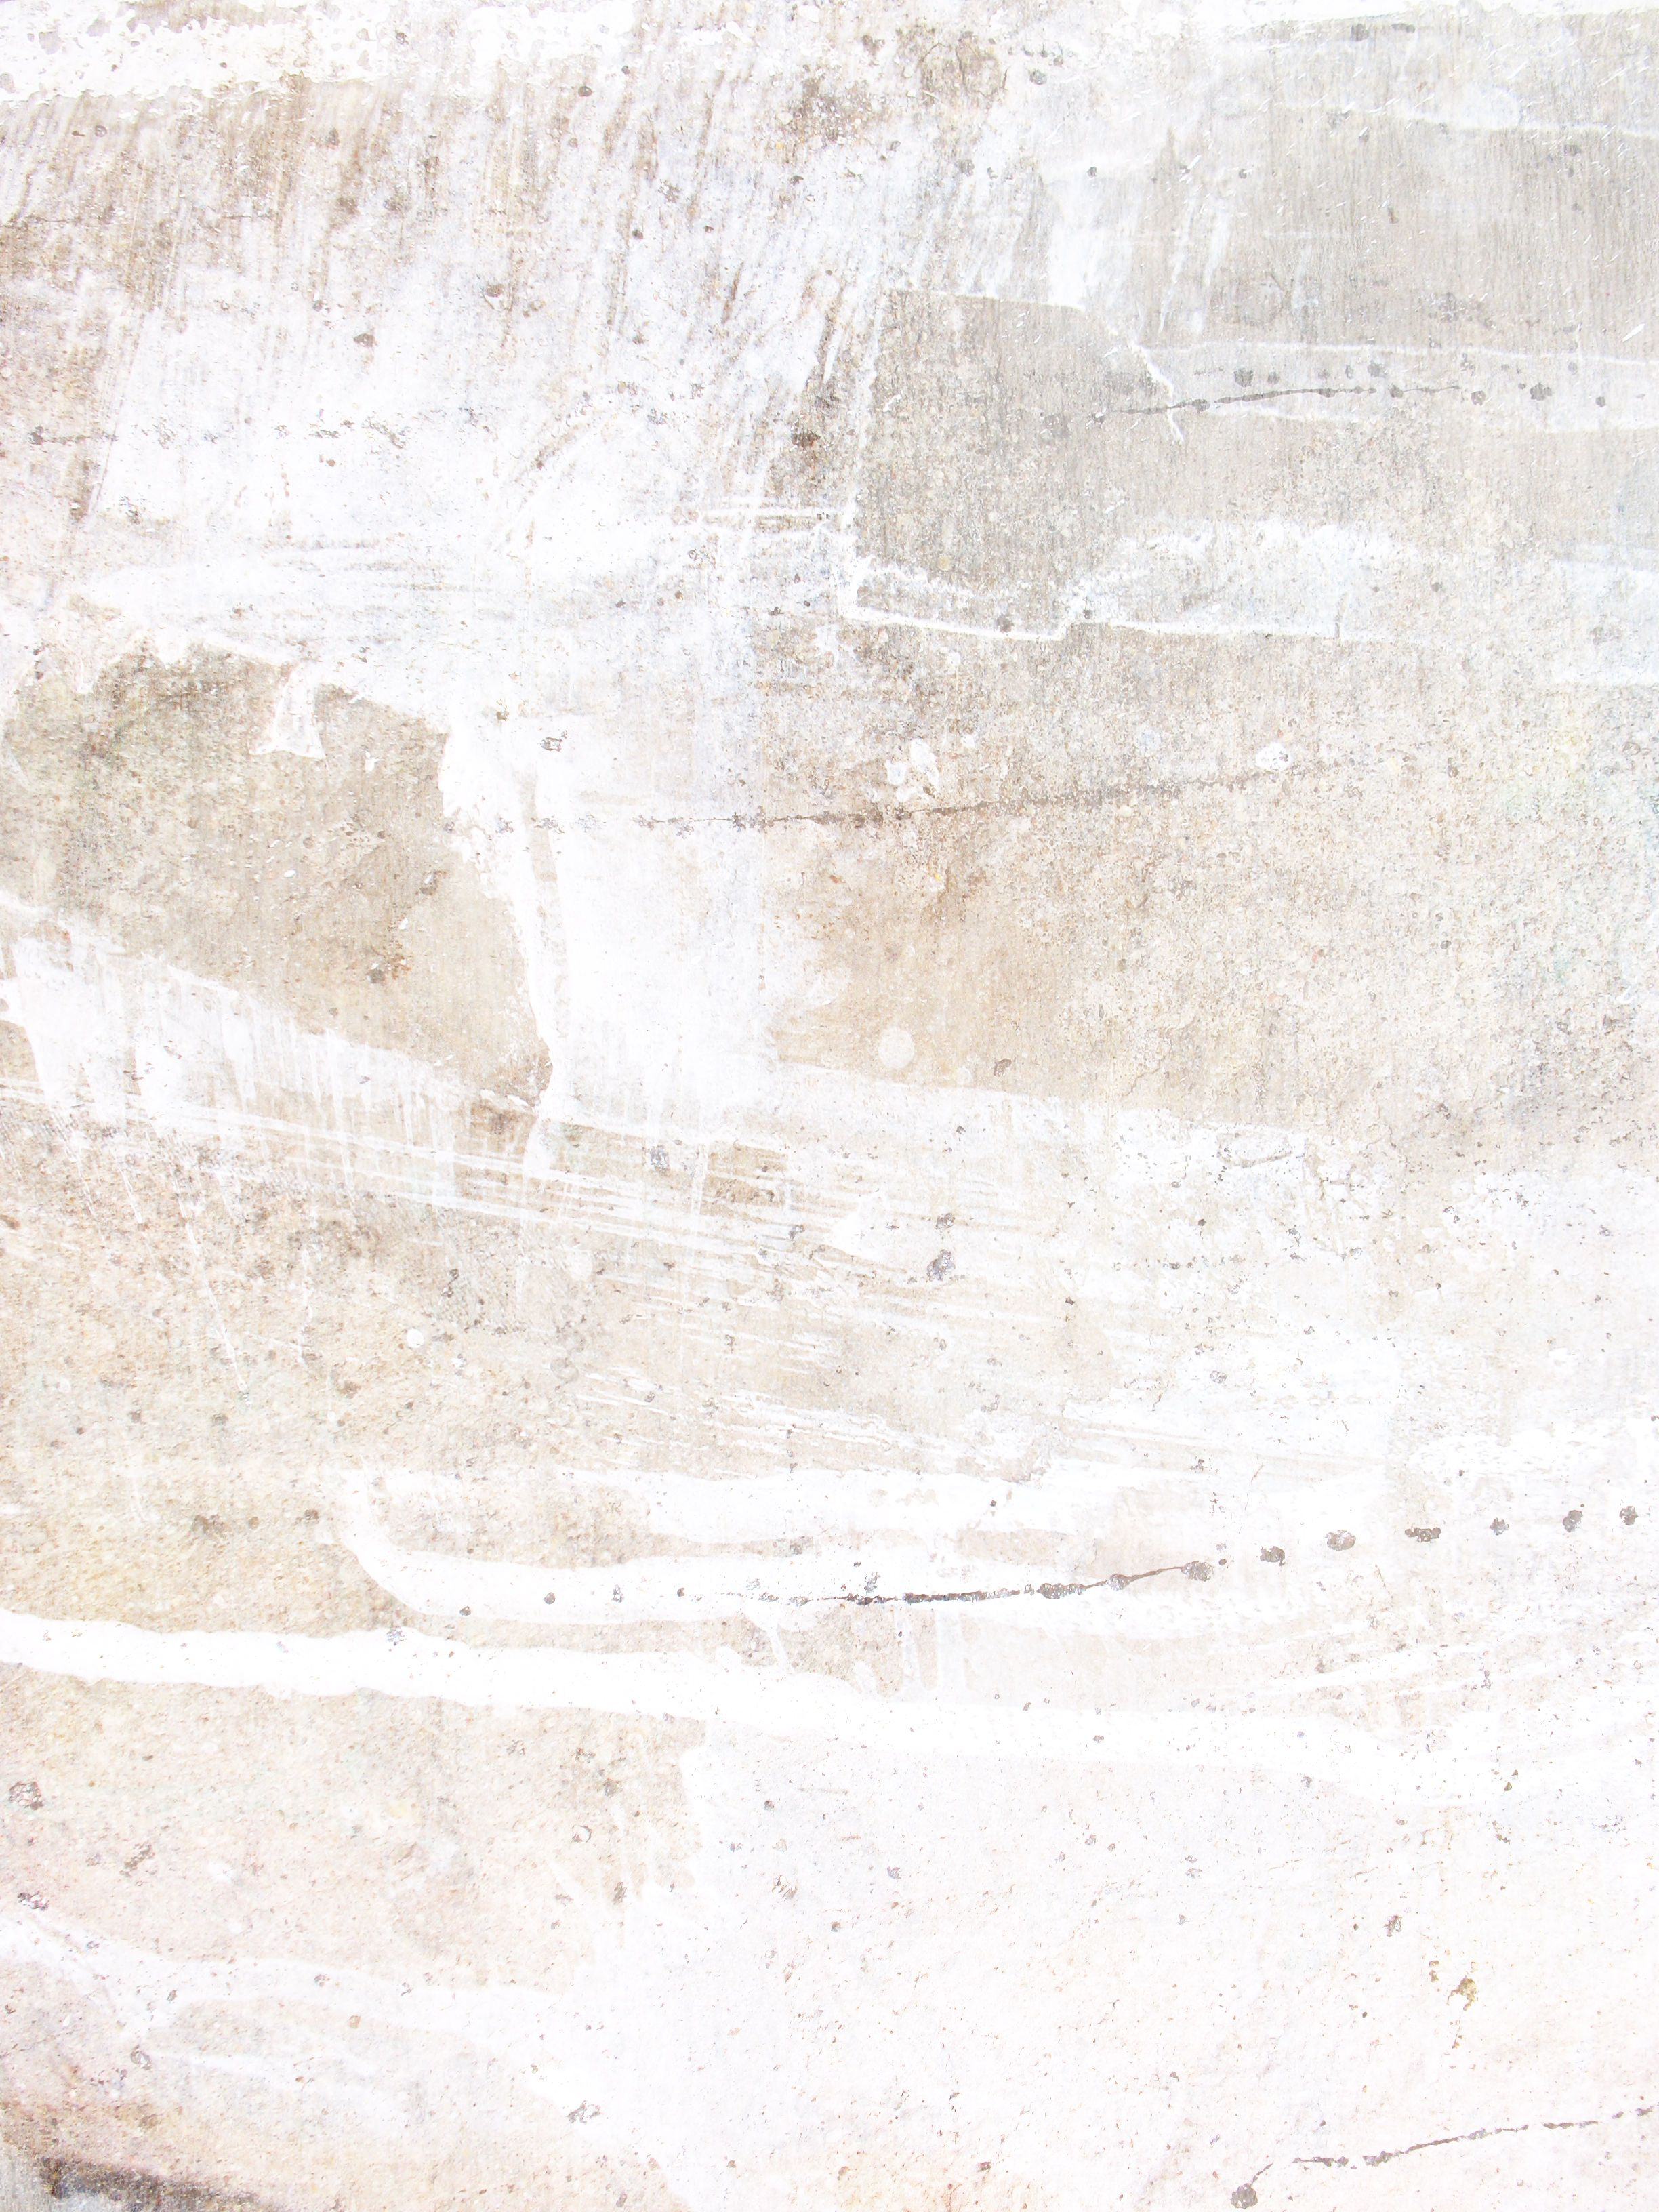 Subtle Grunge Texture | © OVERLAYS in 2019 | Watercolor